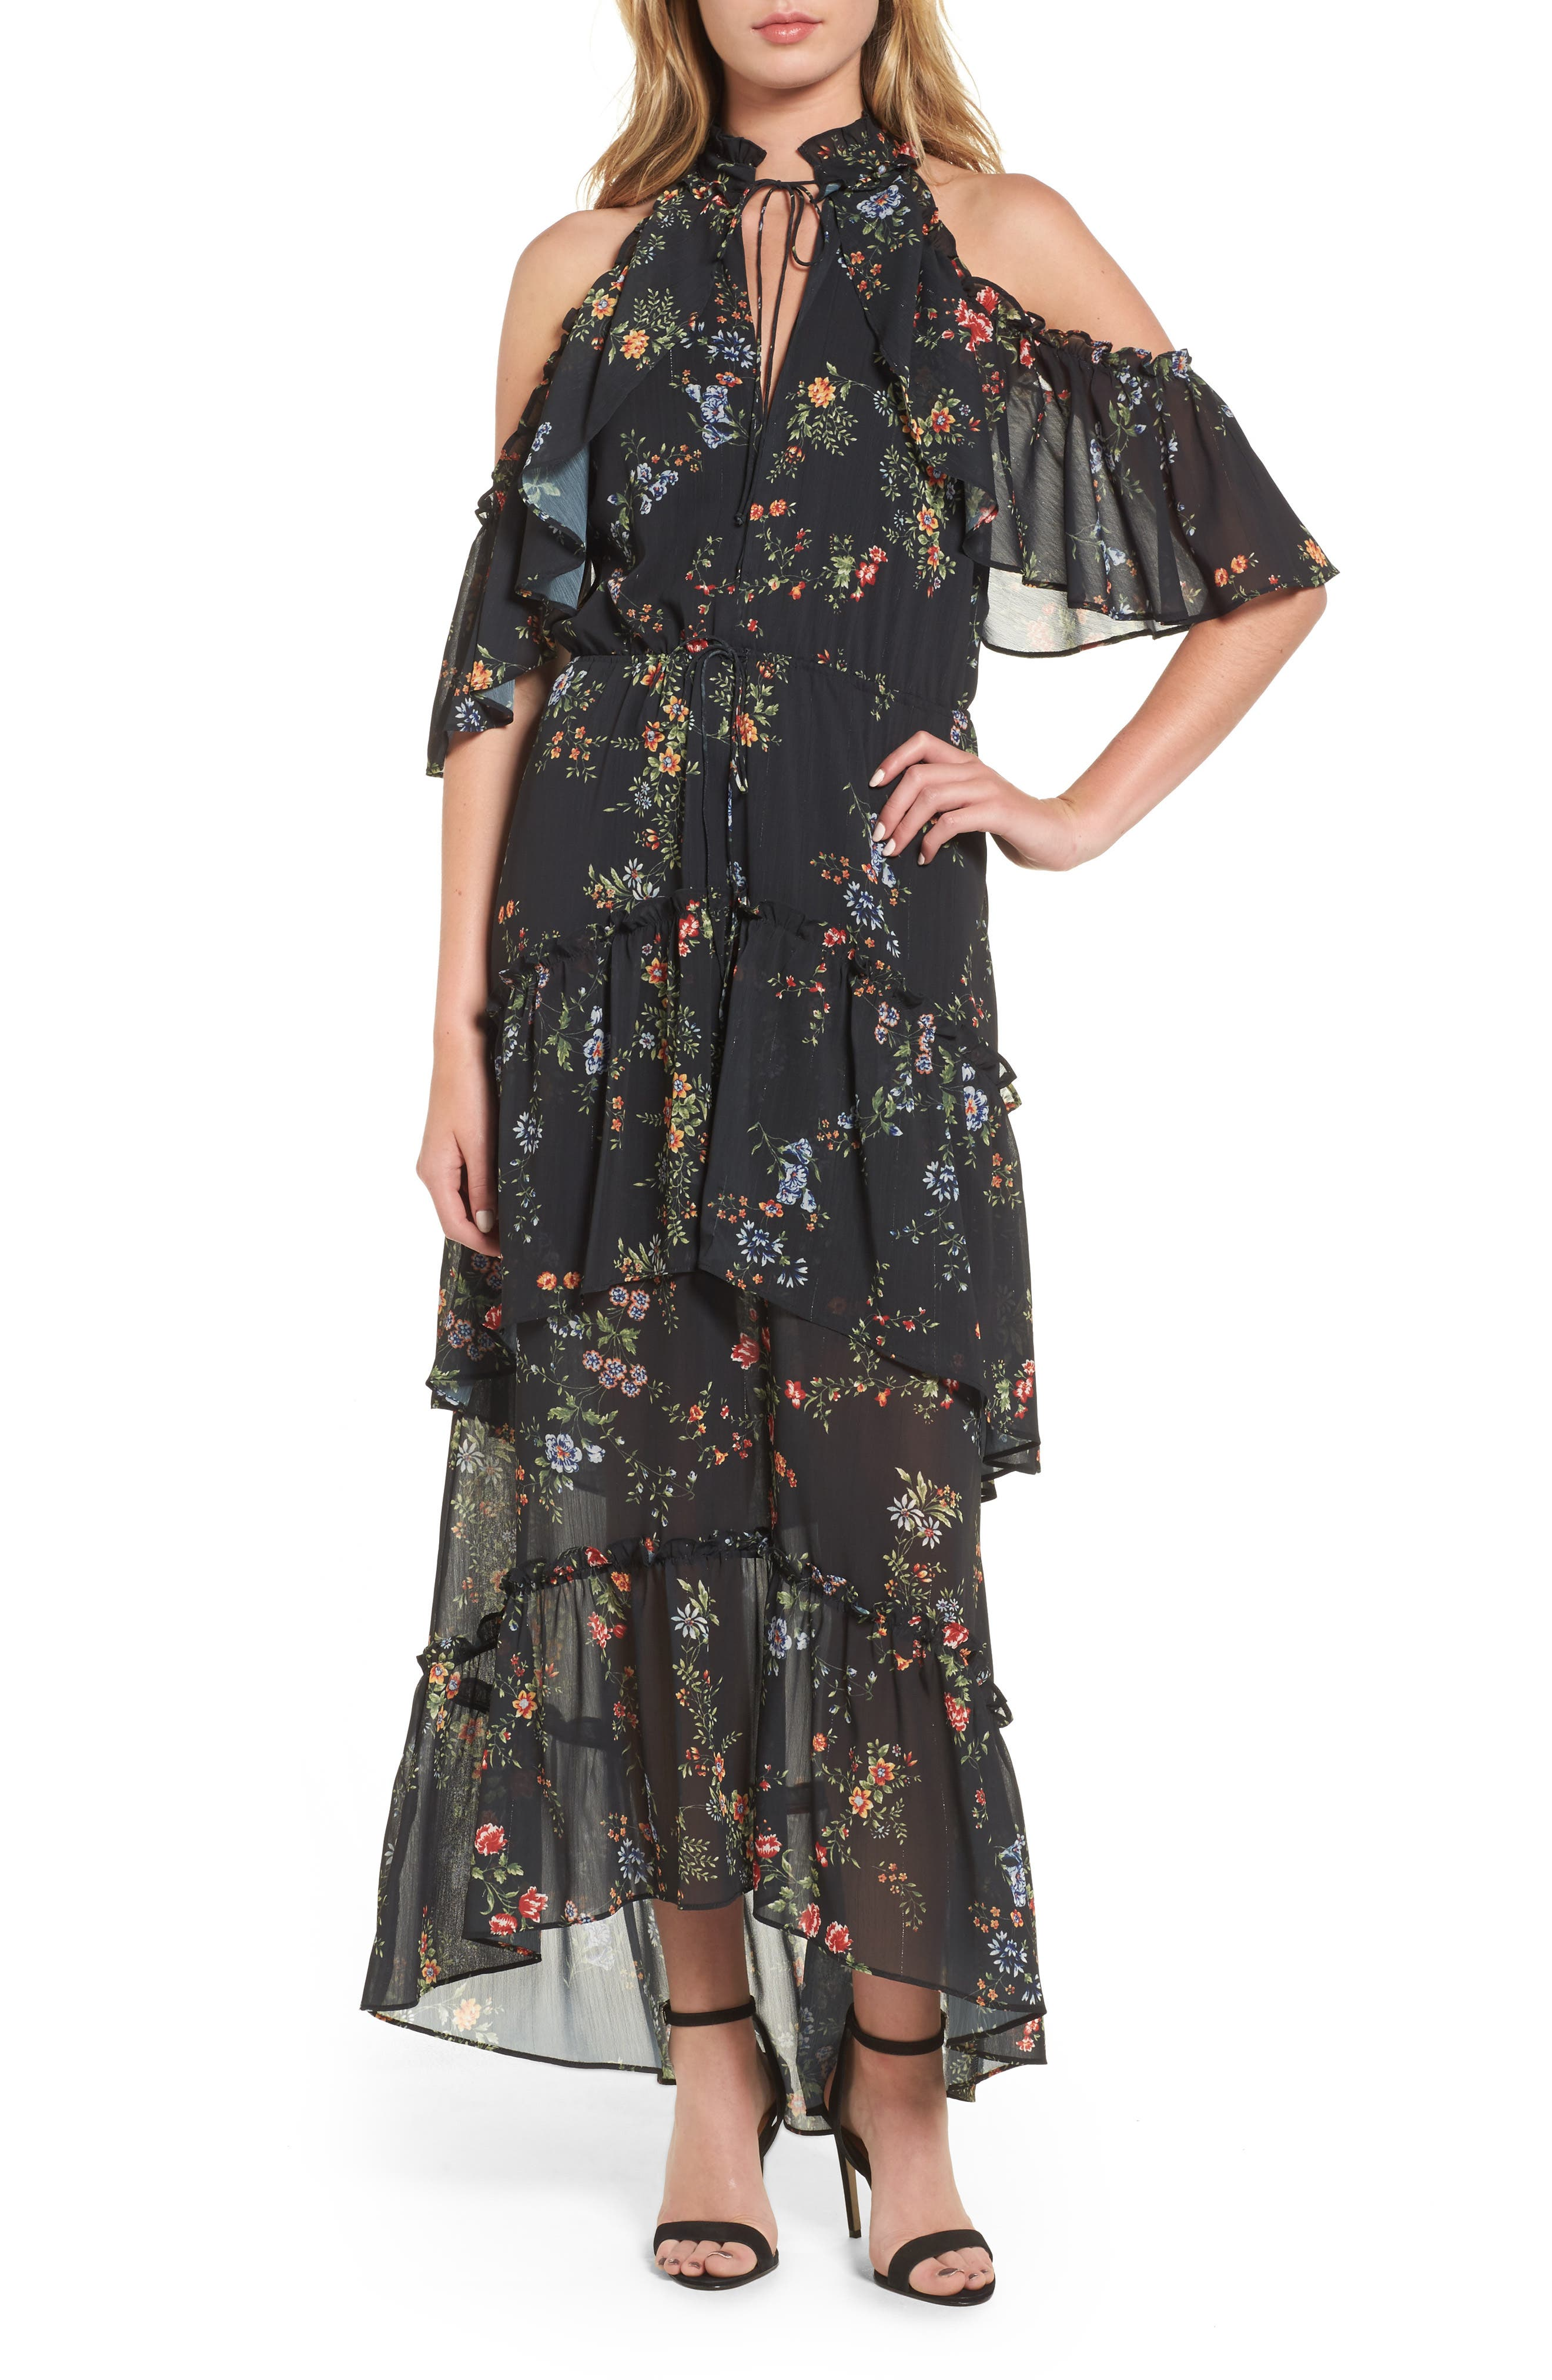 ARRIVE London Cold Shoulder Maxi Dress